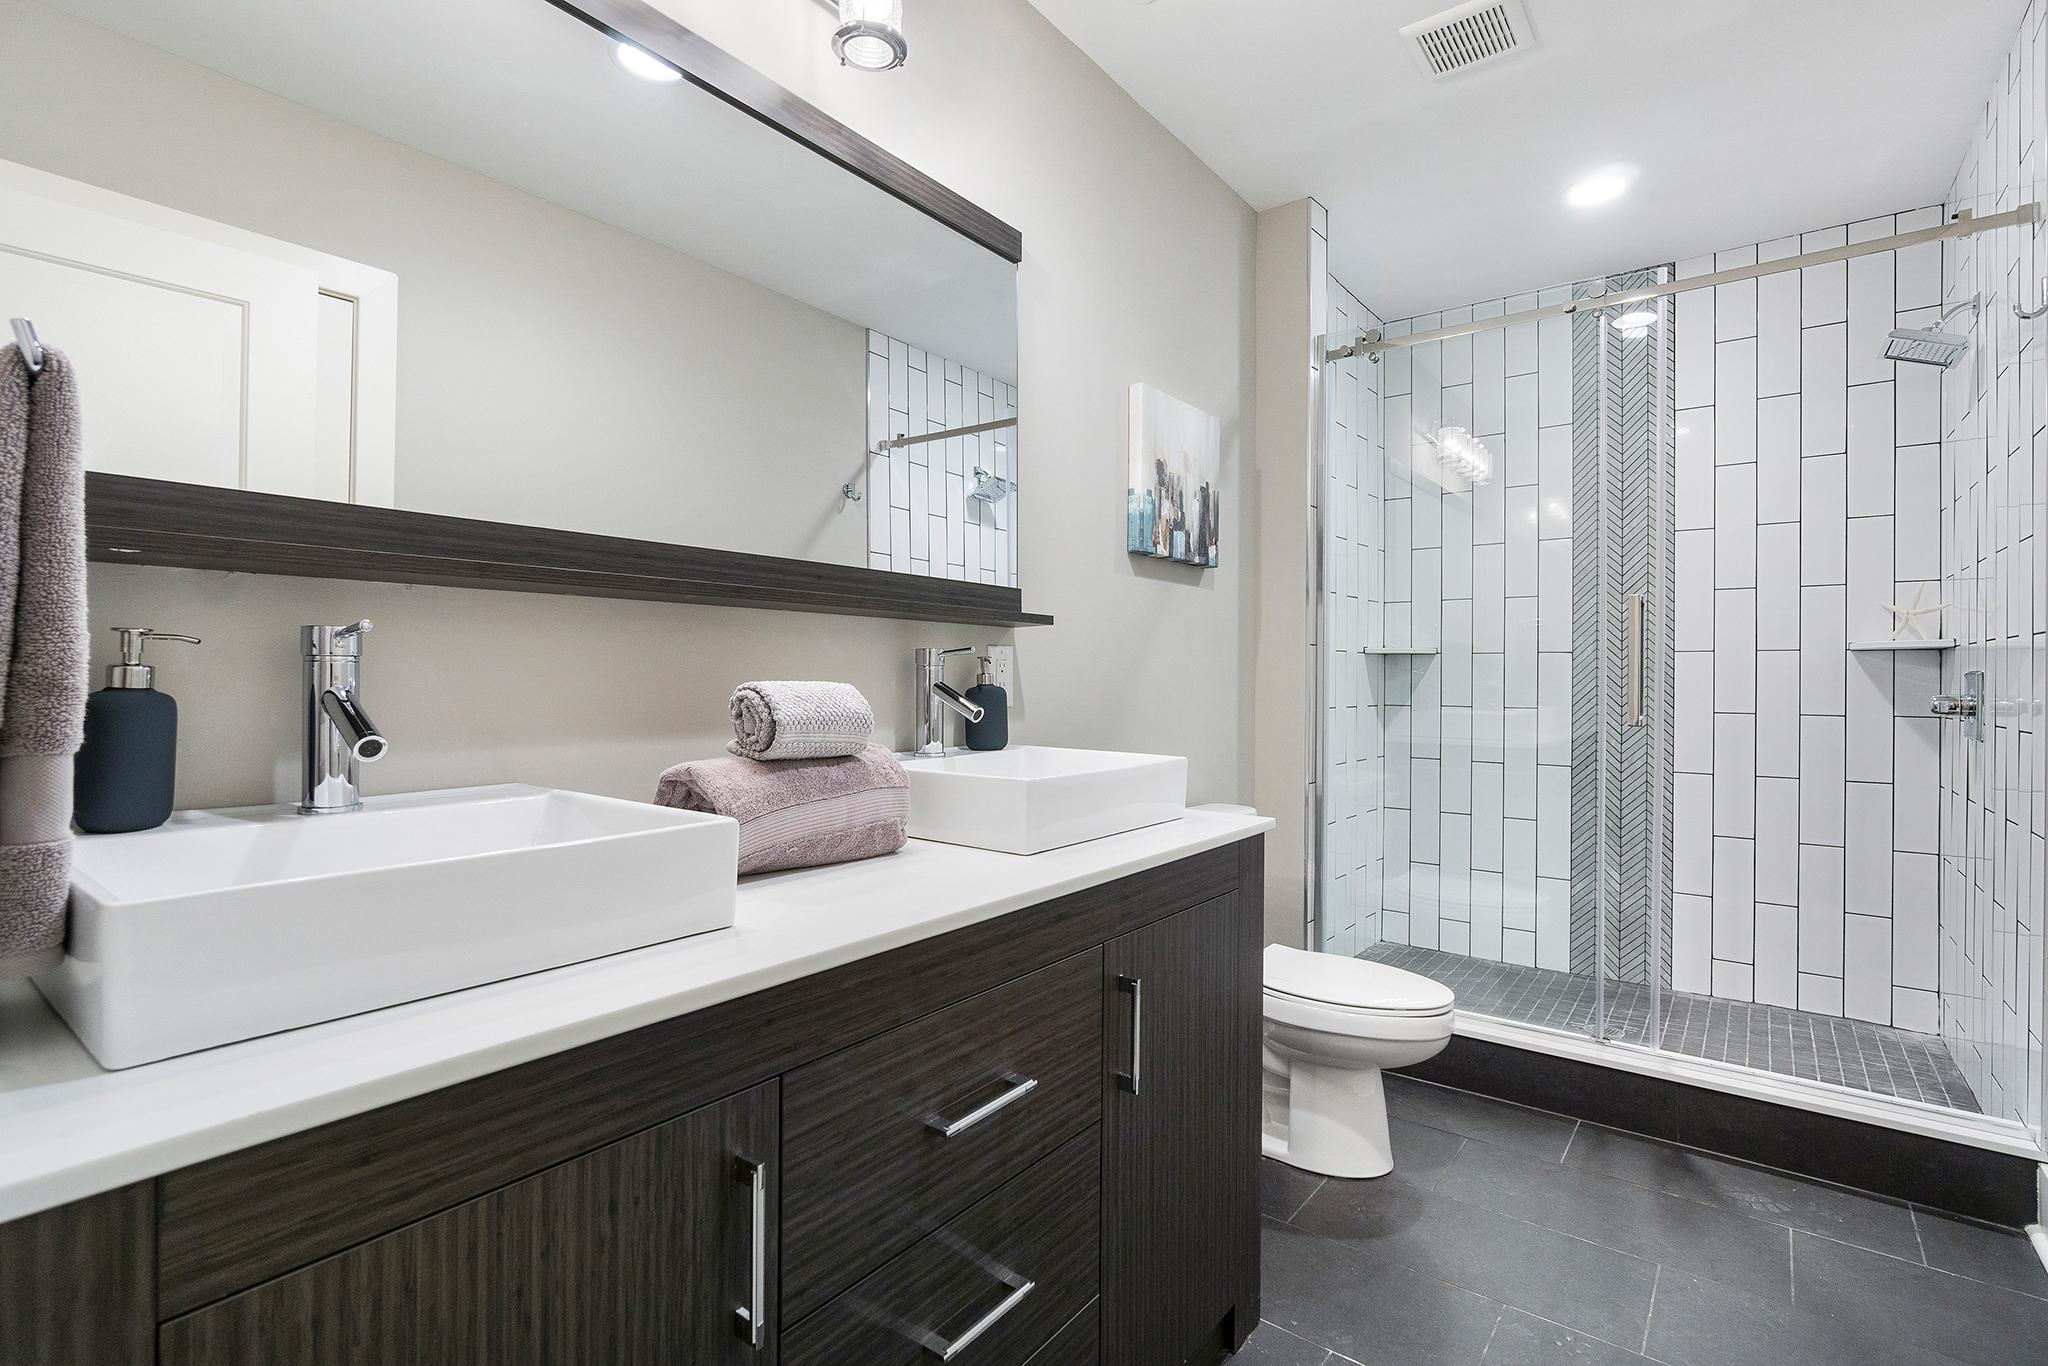 Bathroom at Beautiful 819 N Uber St